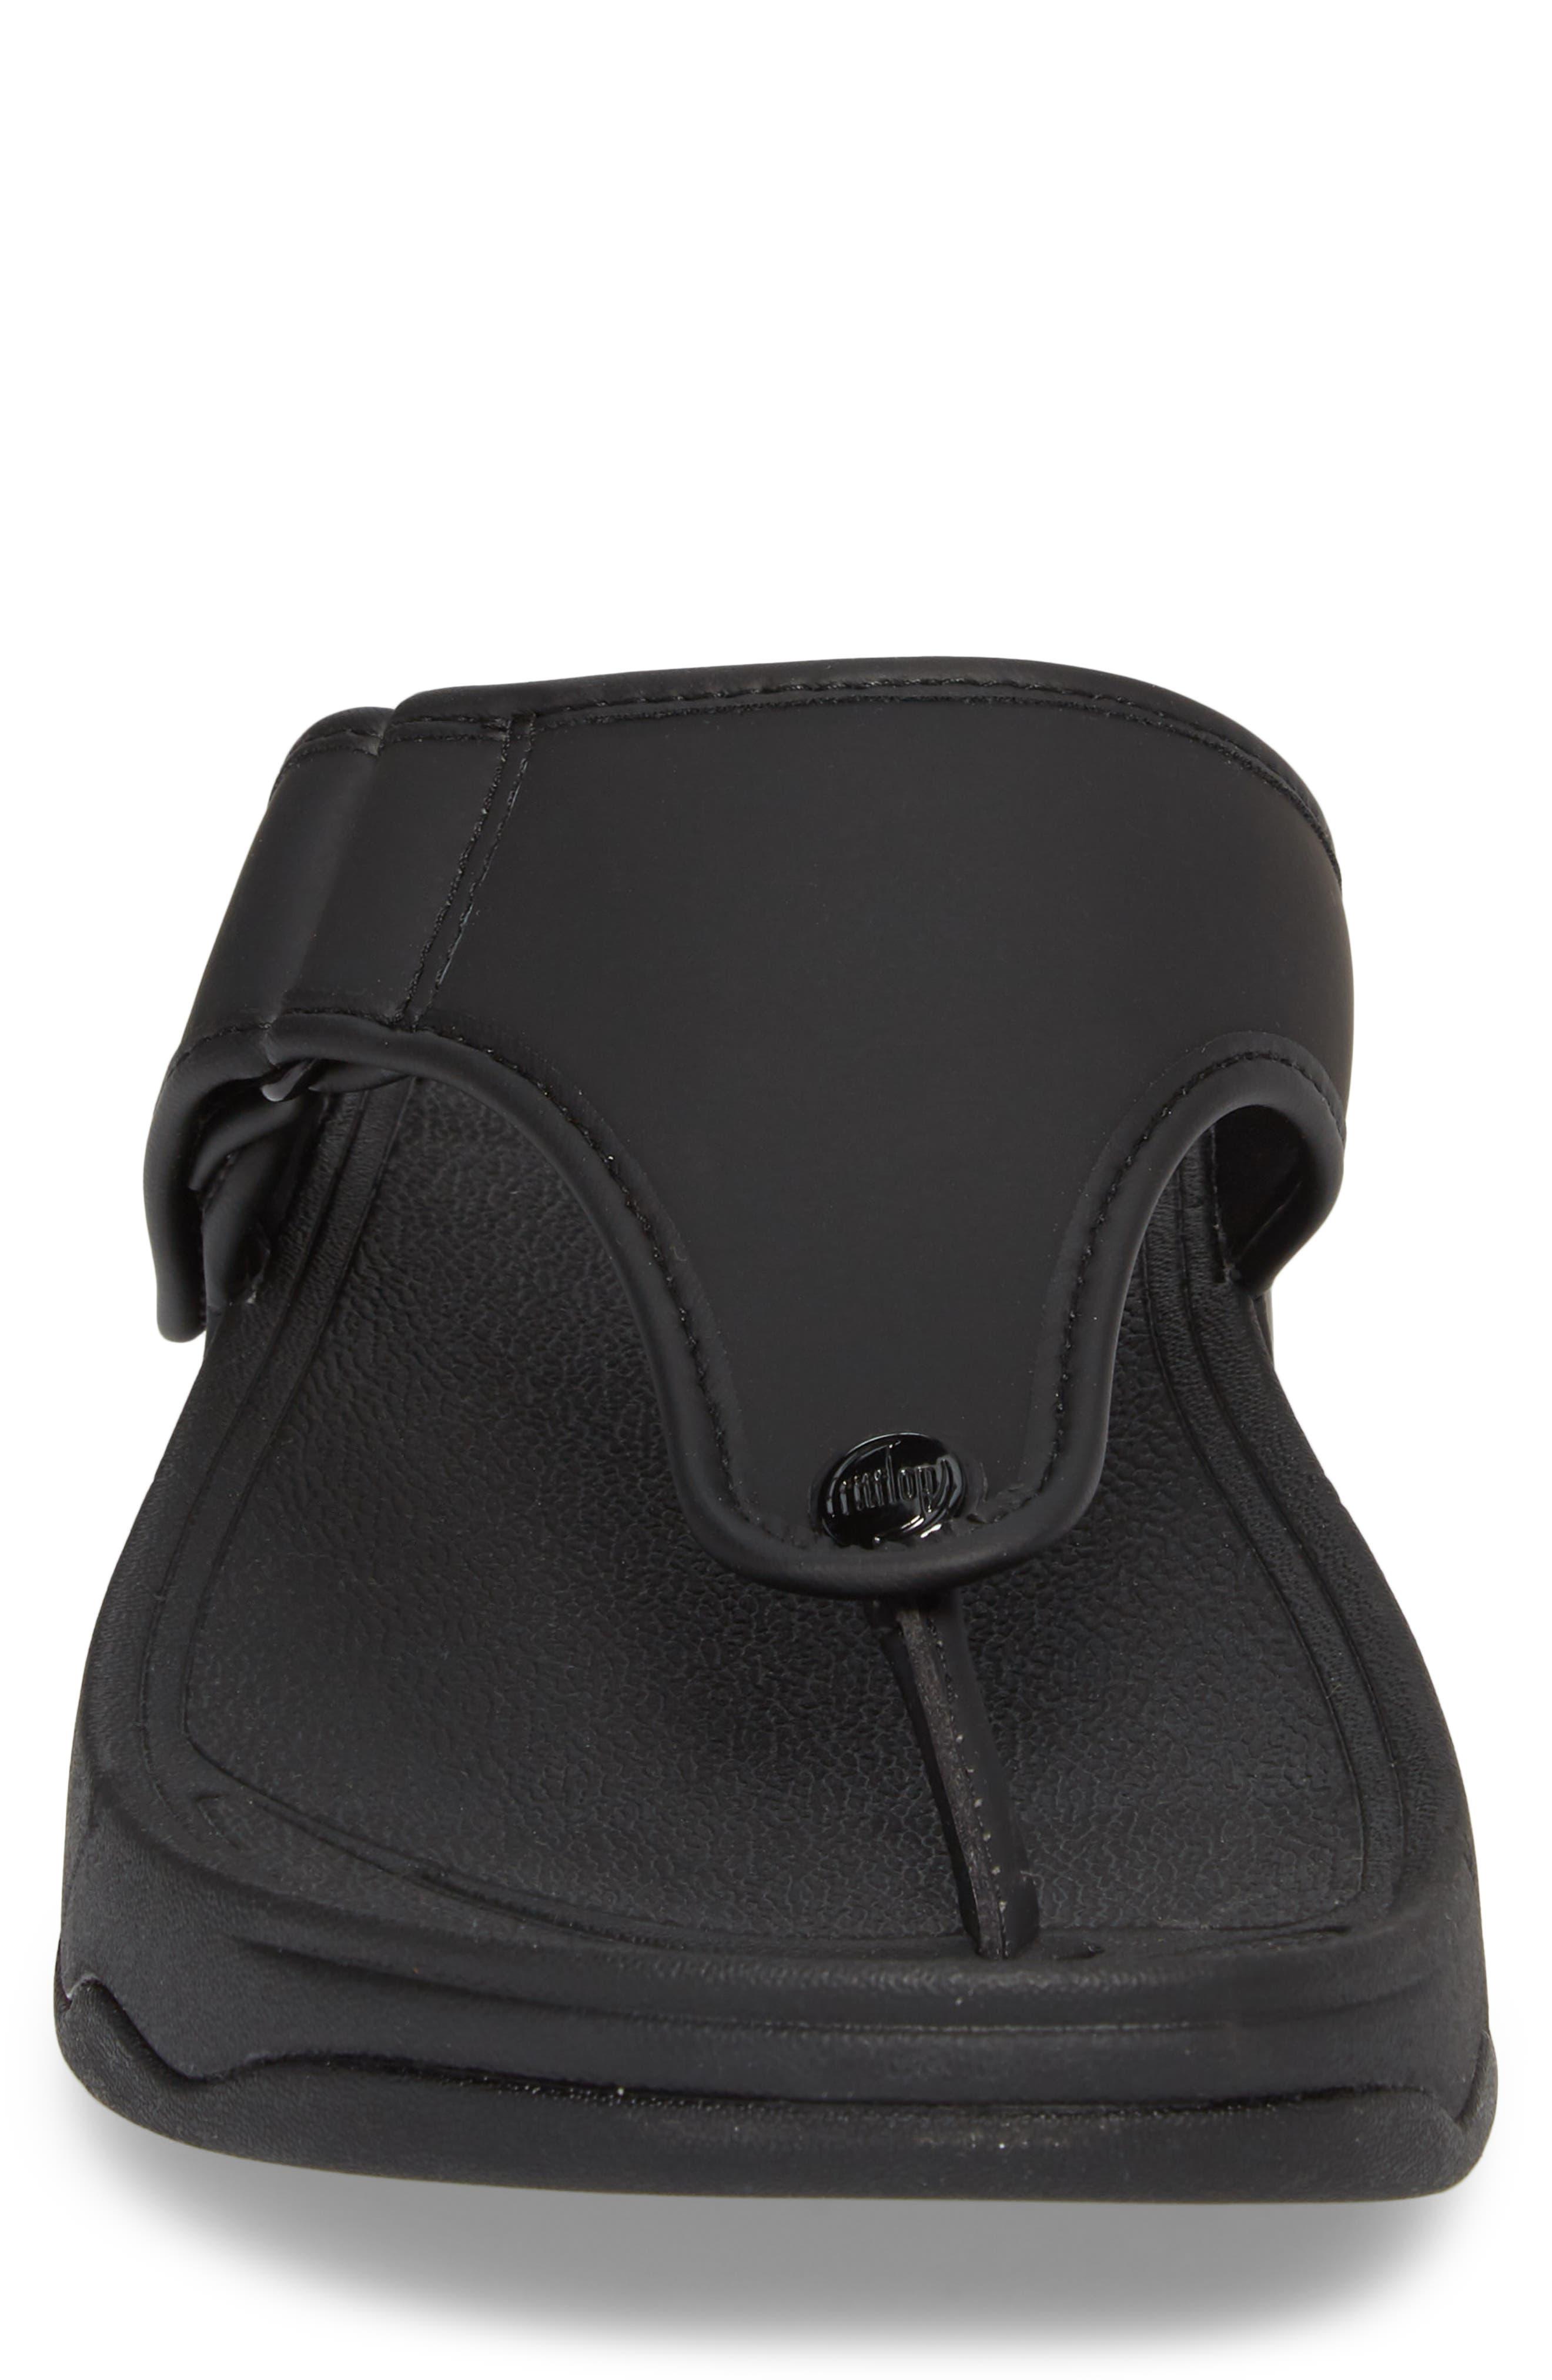 FITFLOP, Trakk<sup>™</sup> II Sandal, Alternate thumbnail 4, color, BLACK NEOPRENE